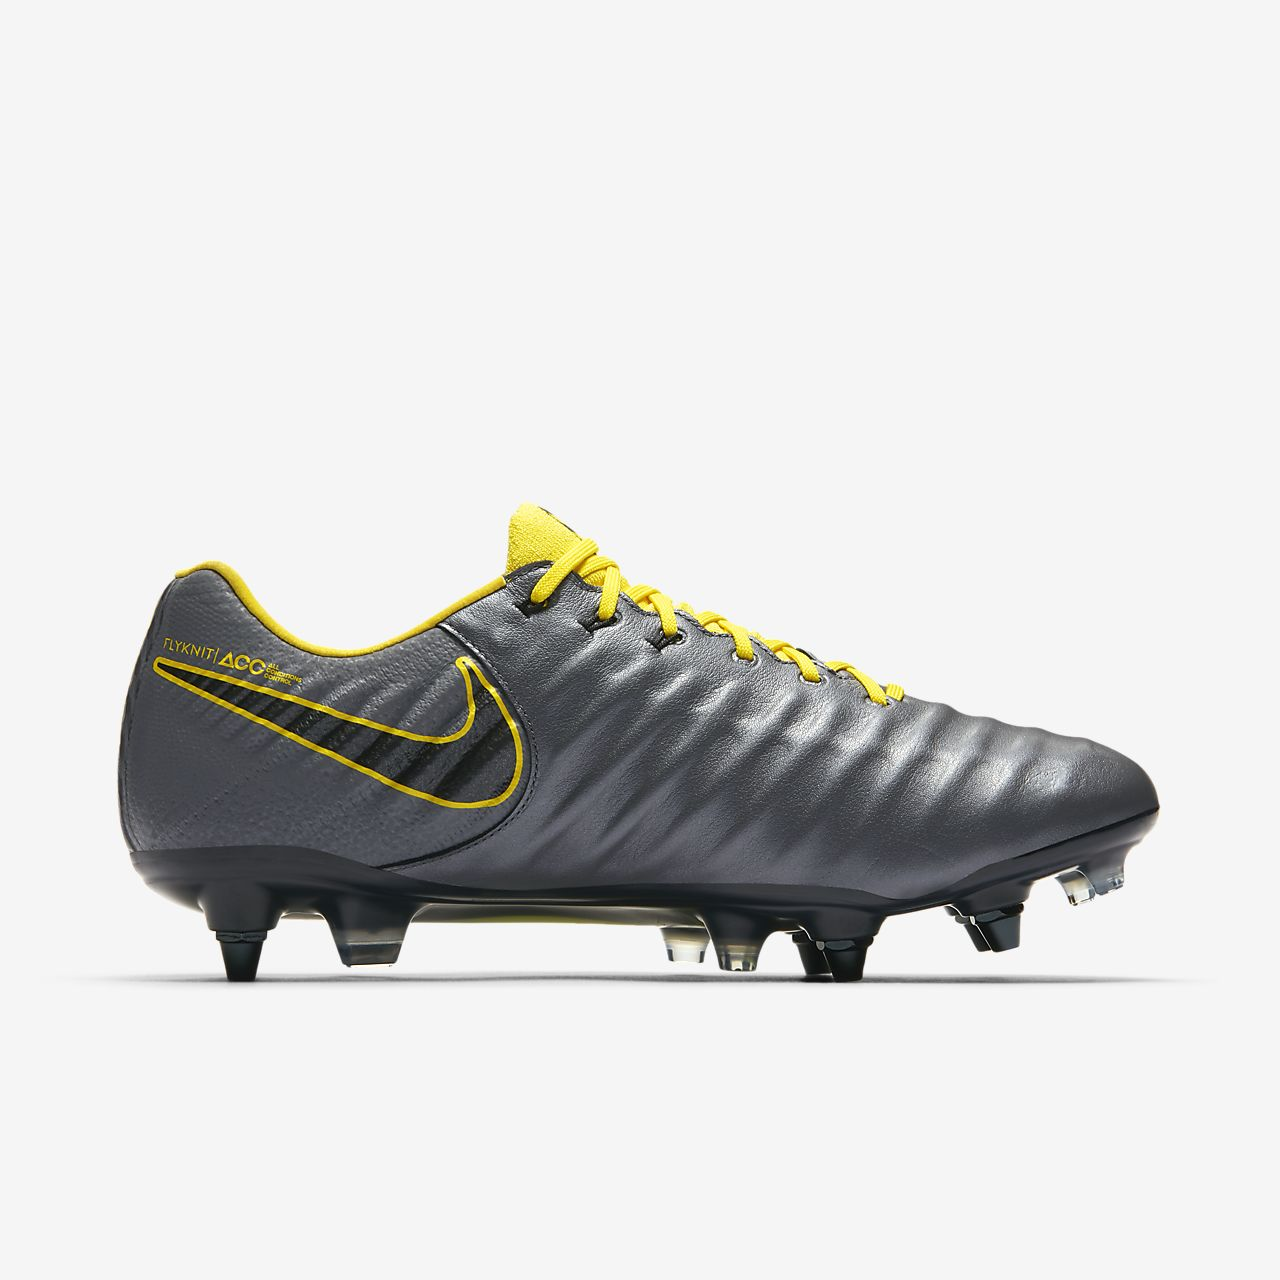 best sneakers c87c5 65b81 ... Nike Tiempo Legend VII Elite SG-Pro Anti-Clog Soft-Ground Football Boot